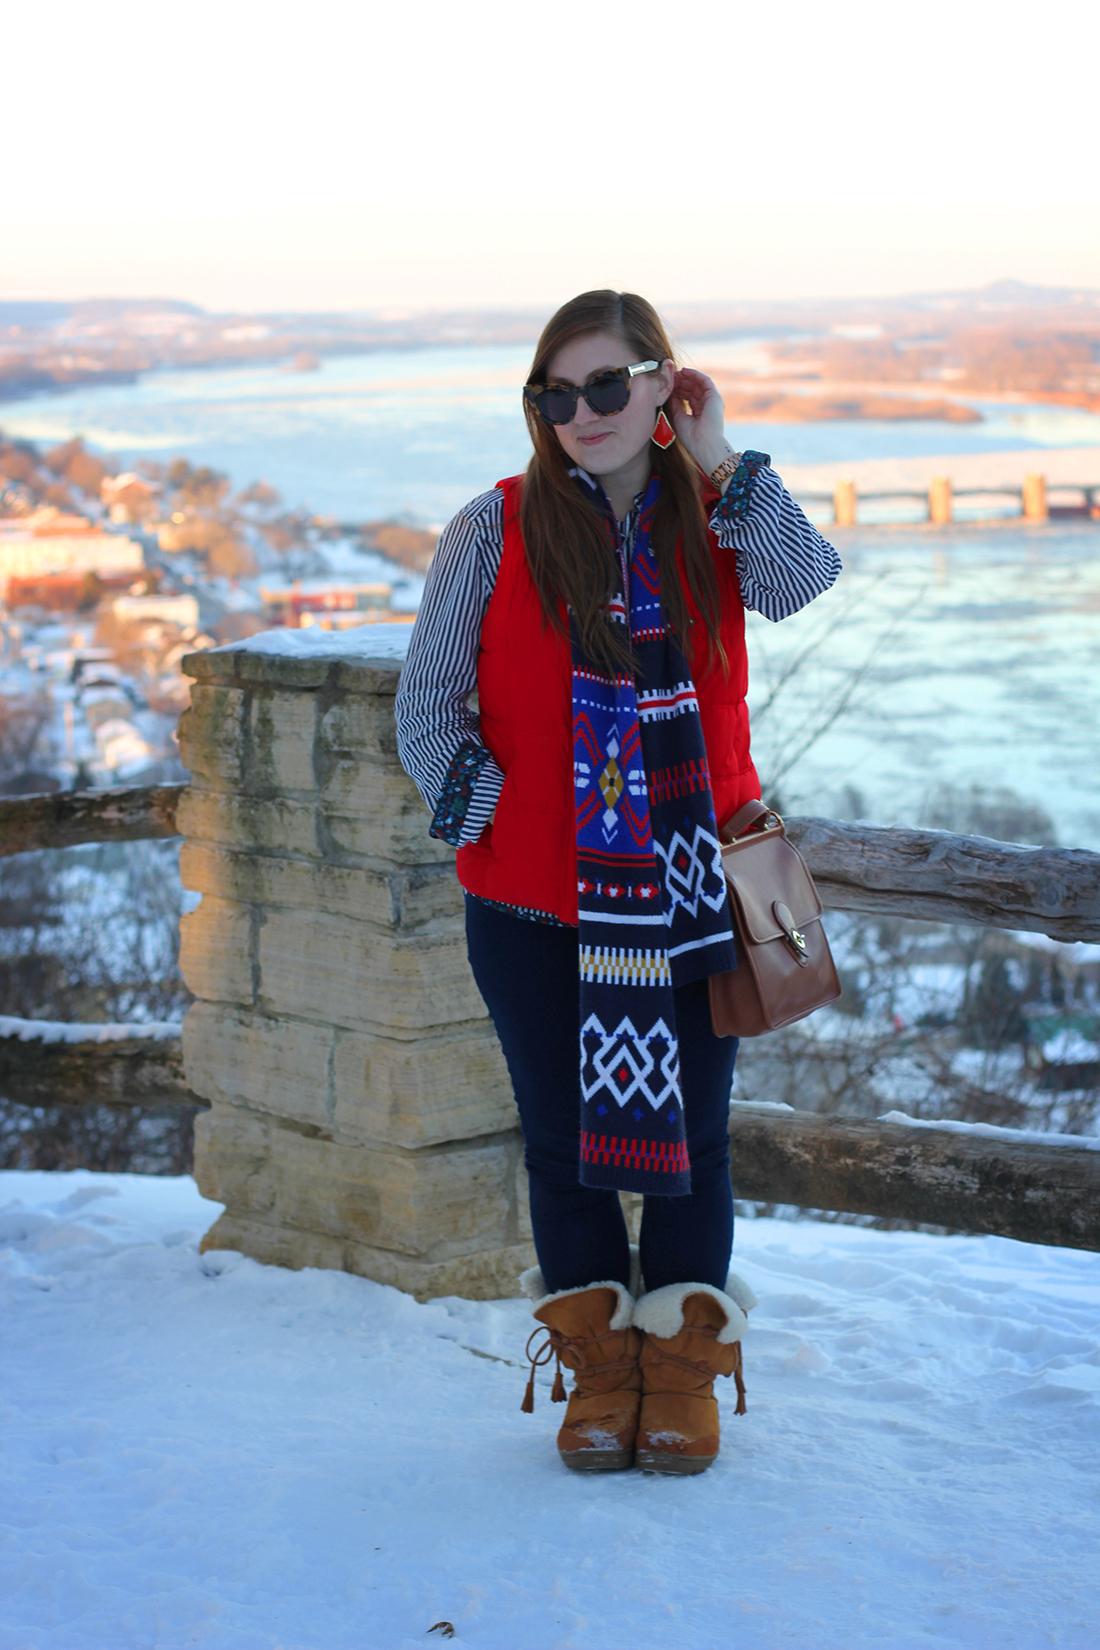 fair-isle-knit-scarf-puffy-vest-shearling-1